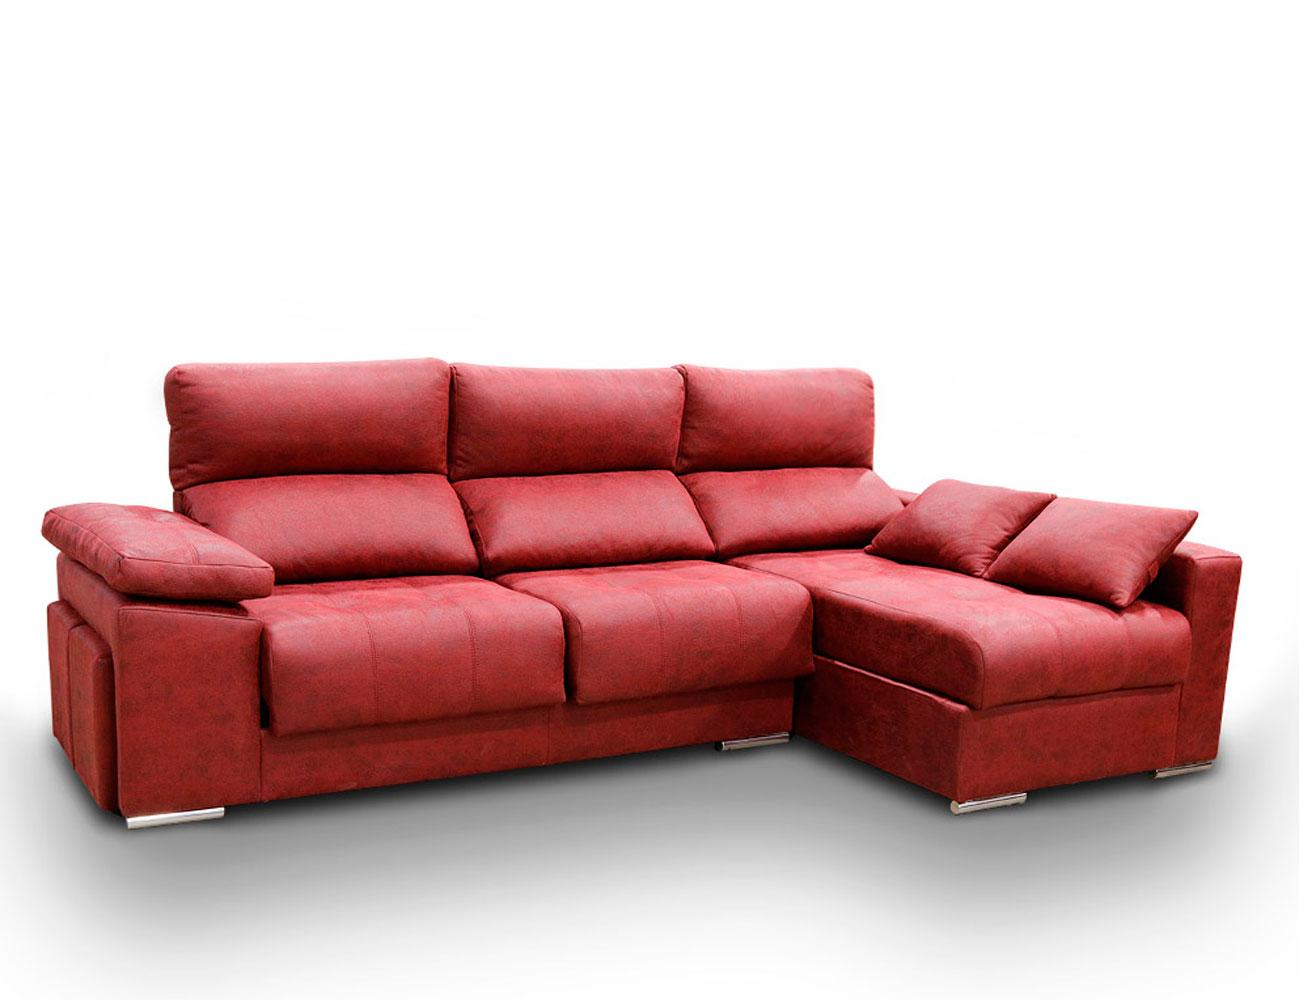 Sofa chaiselongue anti manchas rojo granate5